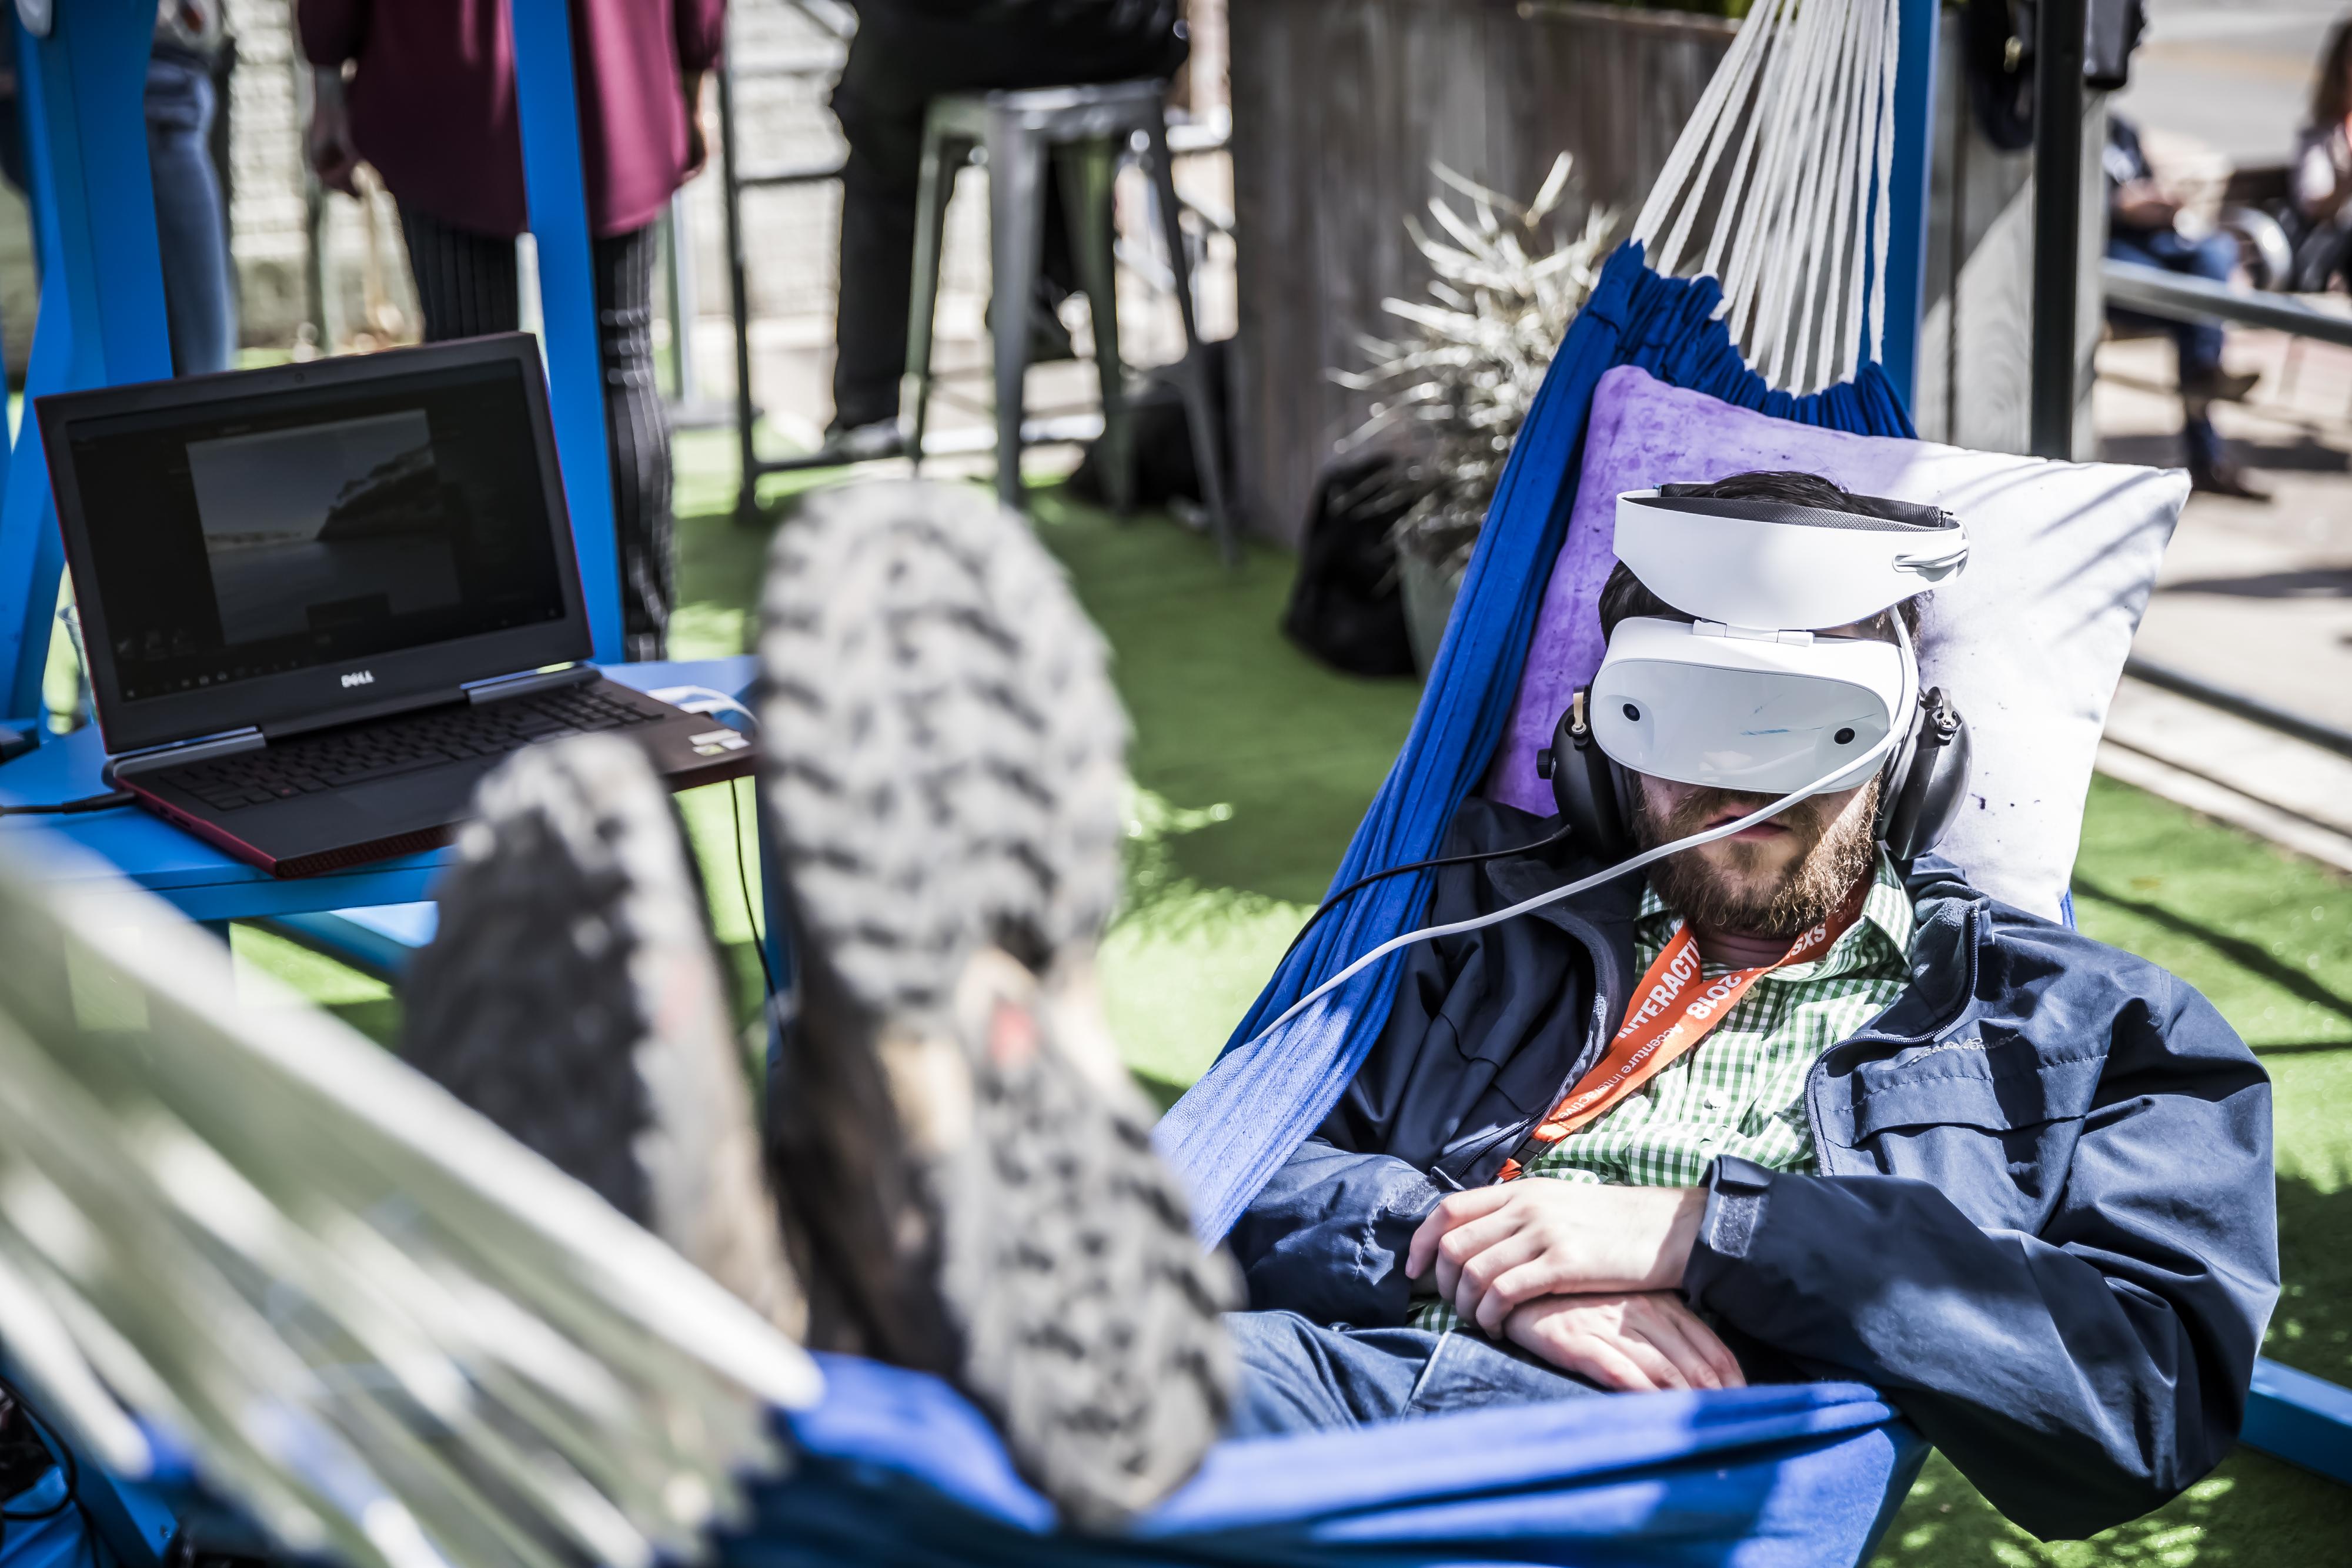 2018 SXSW Conference & Festivals | Photo by Aaron Rogosin